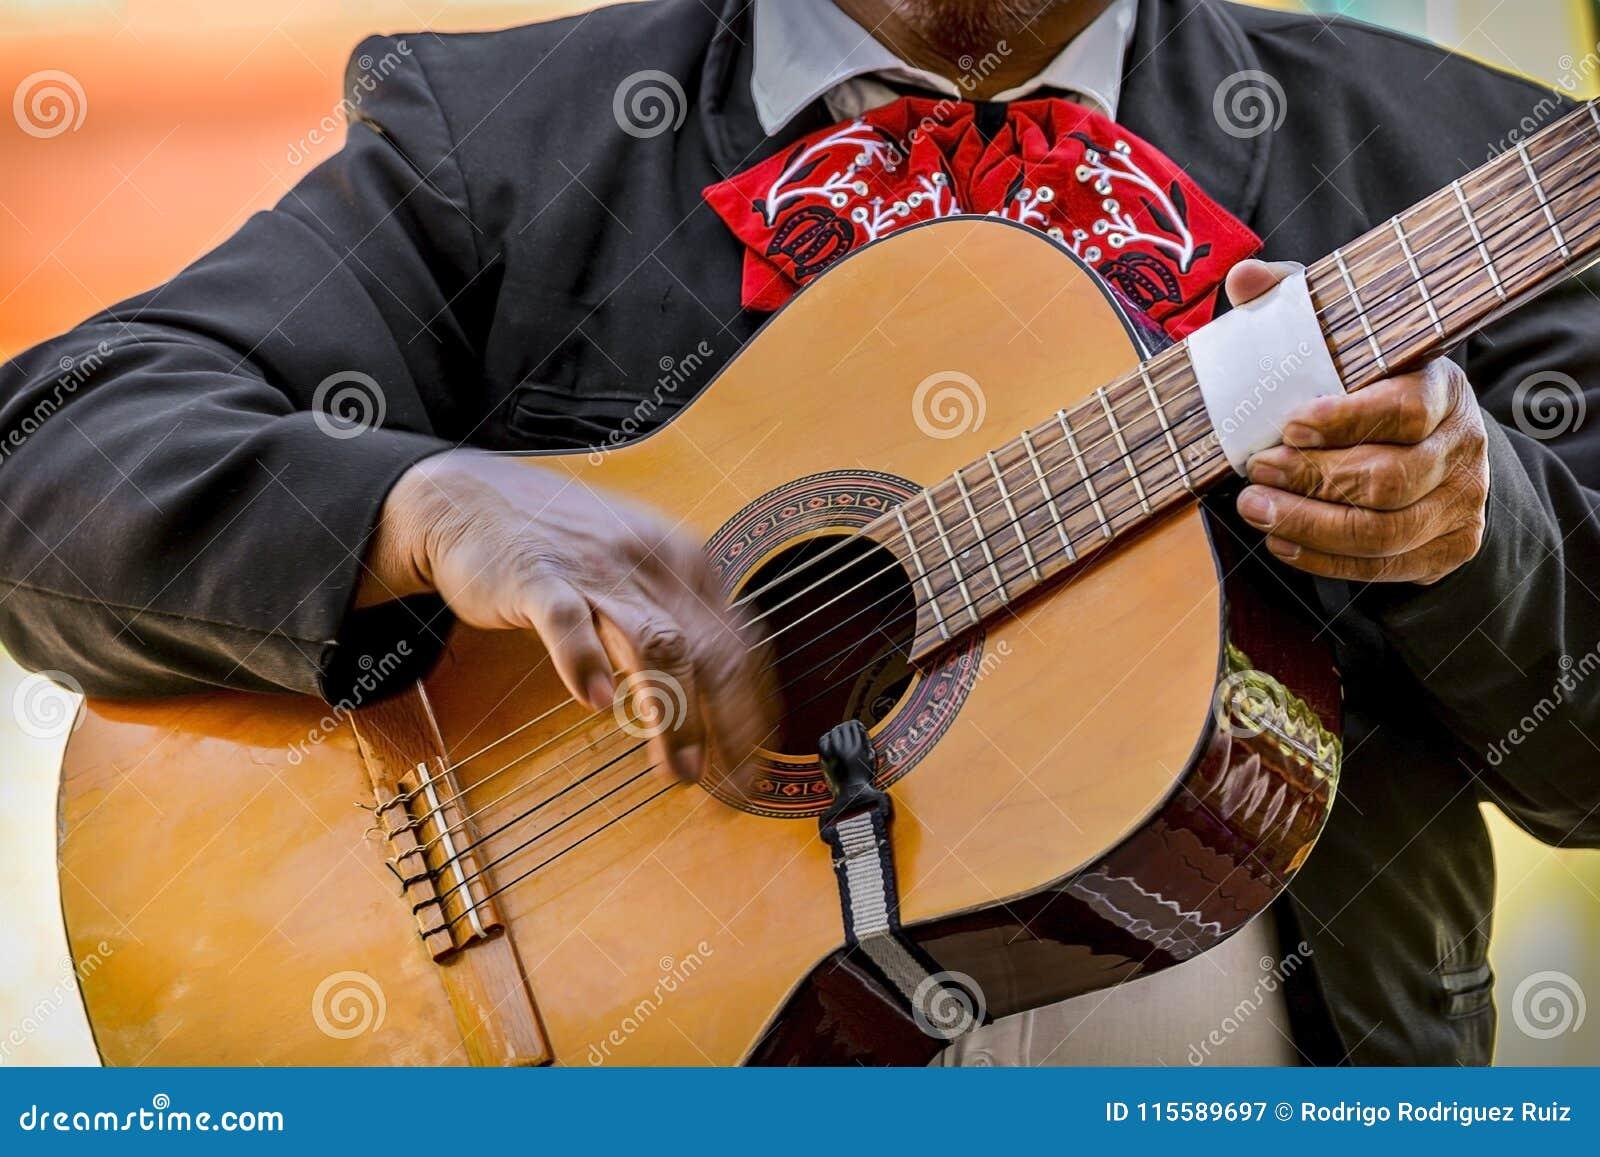 Mariachi που παίζει την ακουστική κιθάρα κατά τη διάρκεια της ημέρας